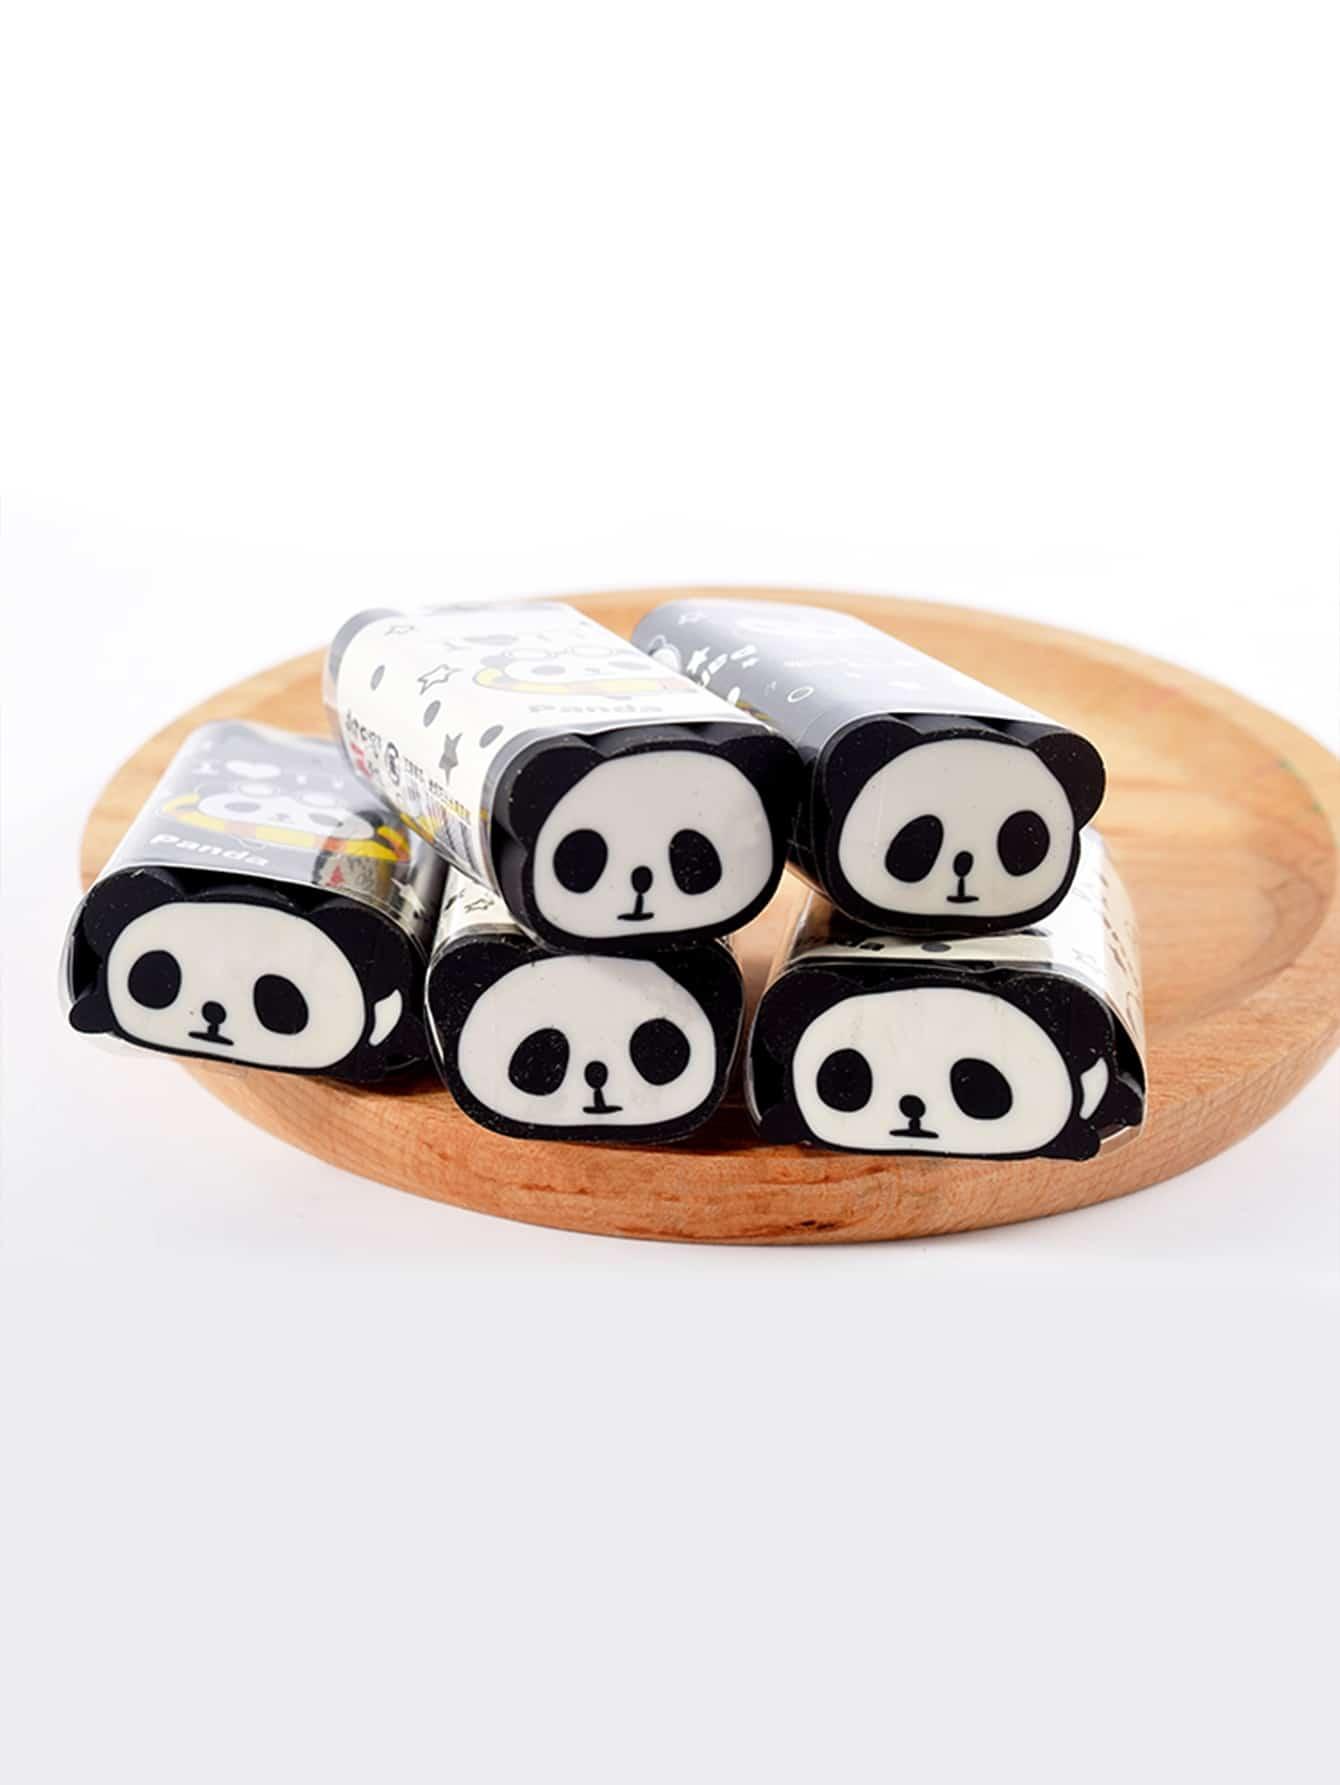 Купить Ластик с рисунком панды 1 шт. расцветка произвольная, null, SheIn